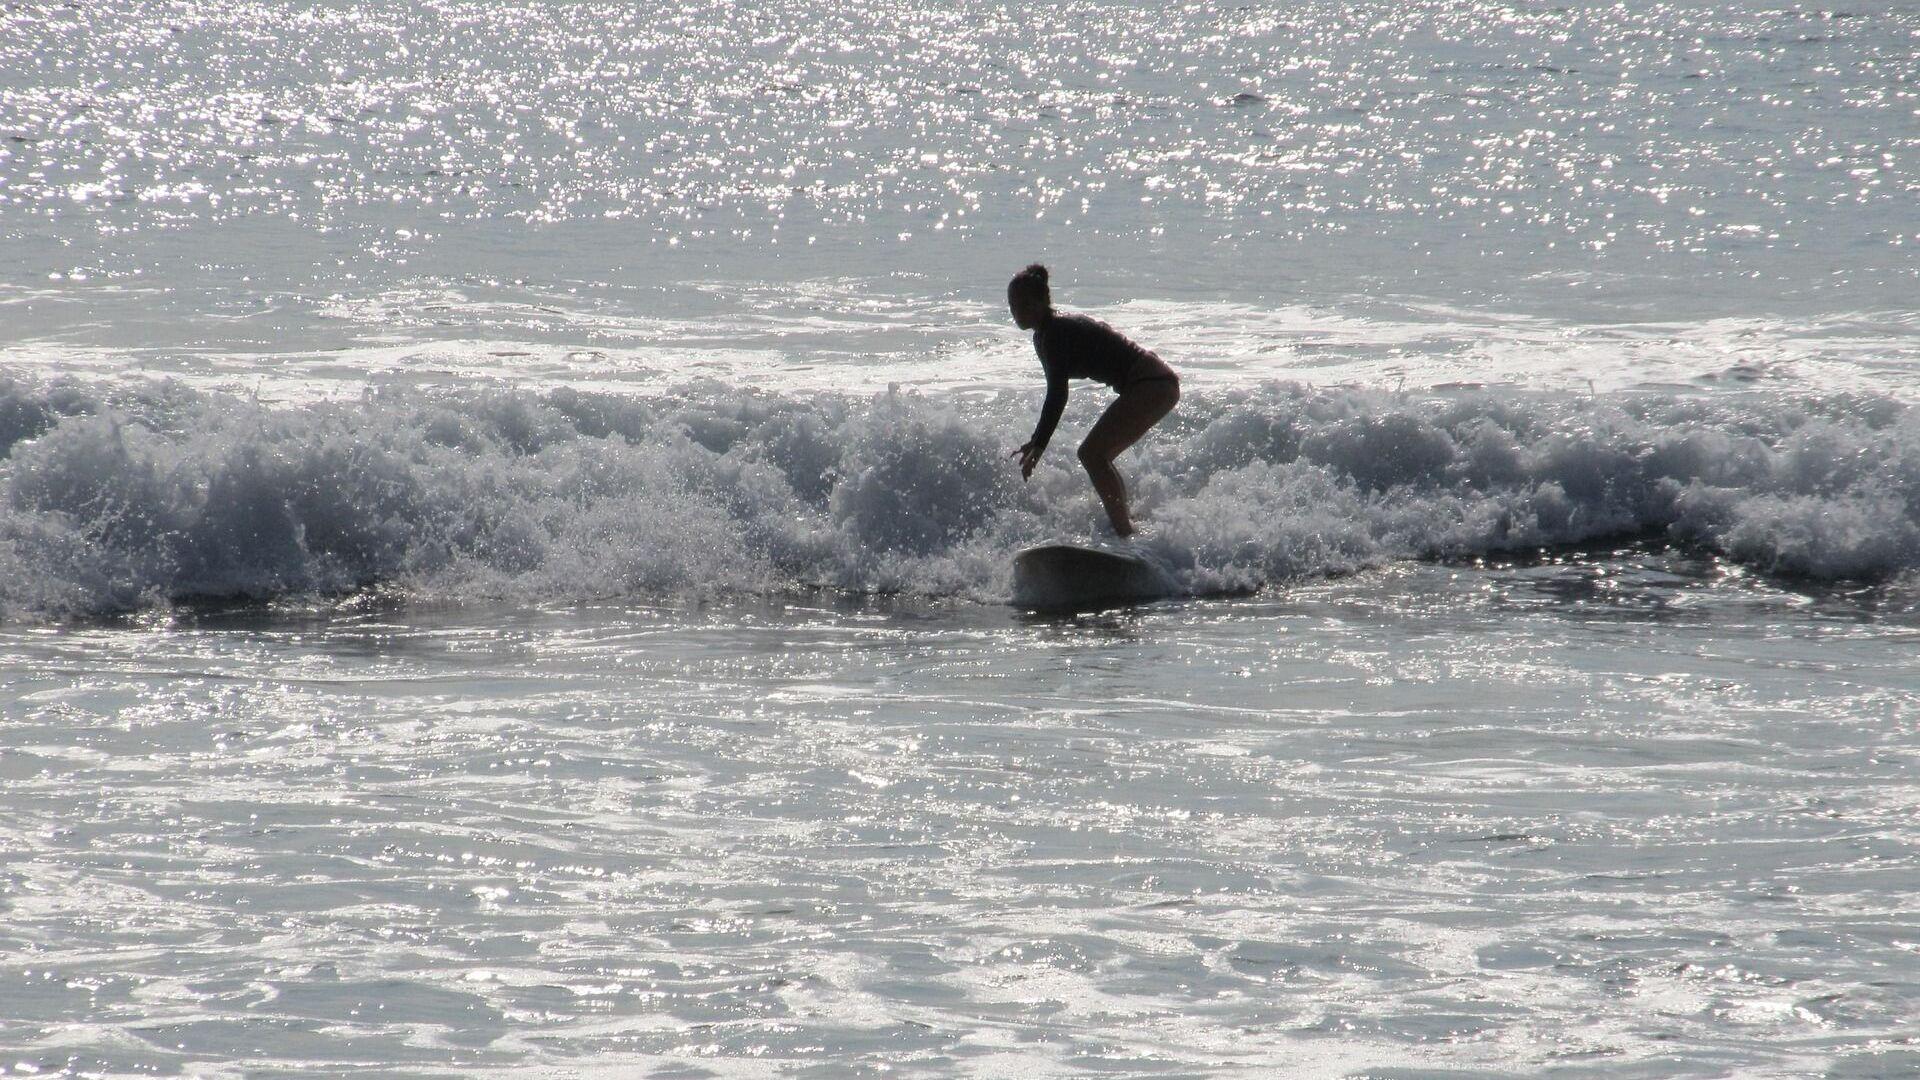 Foto referencial de una surfista - Sputnik Mundo, 1920, 24.03.2021